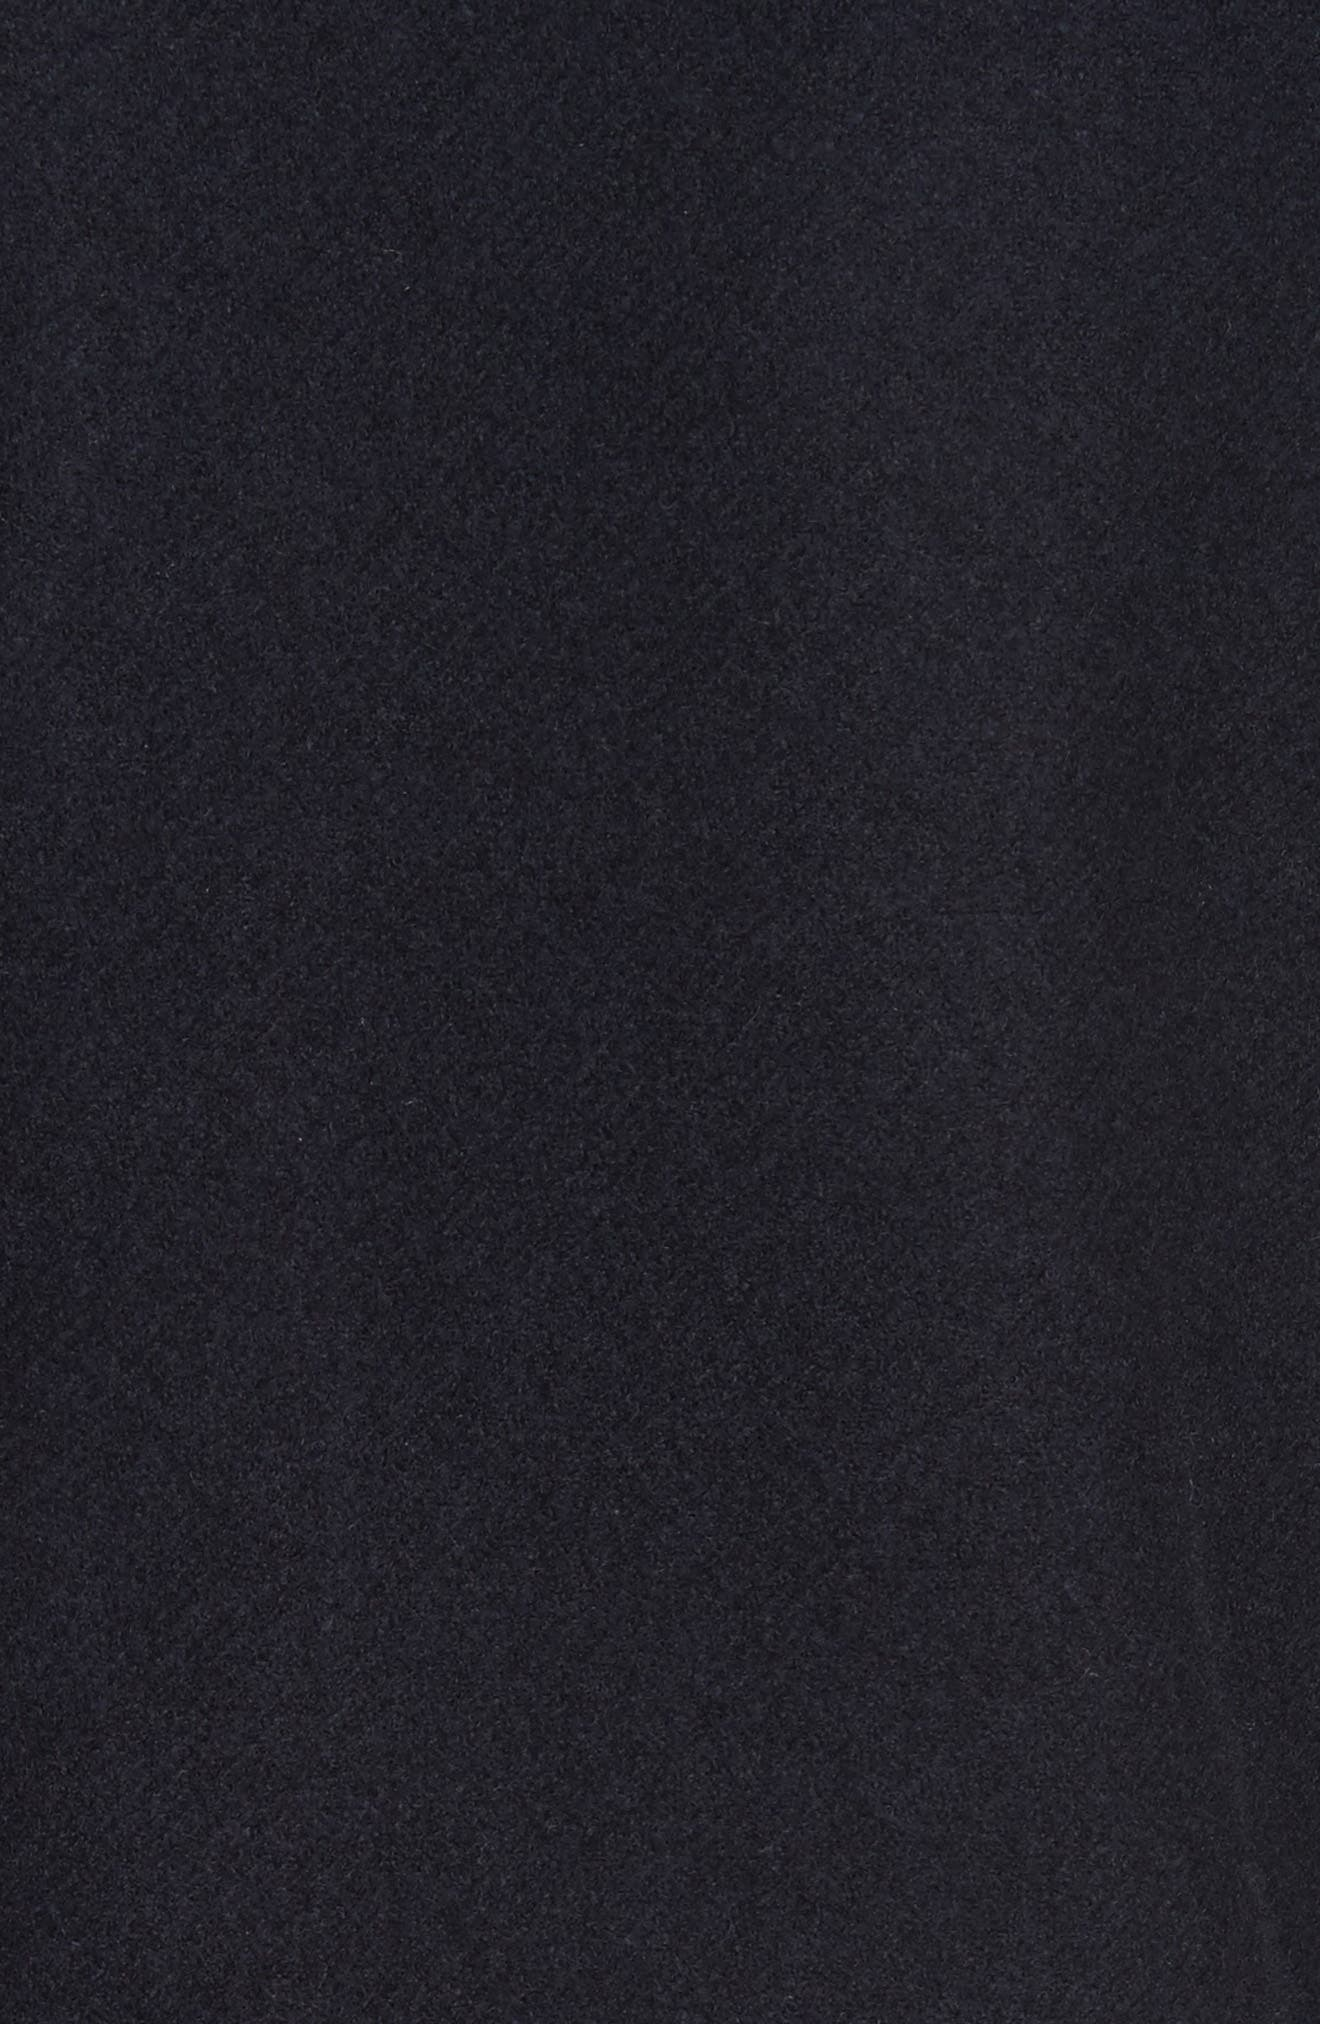 Bryant Merino Wool Blend Jacket,                             Alternate thumbnail 6, color,                             410